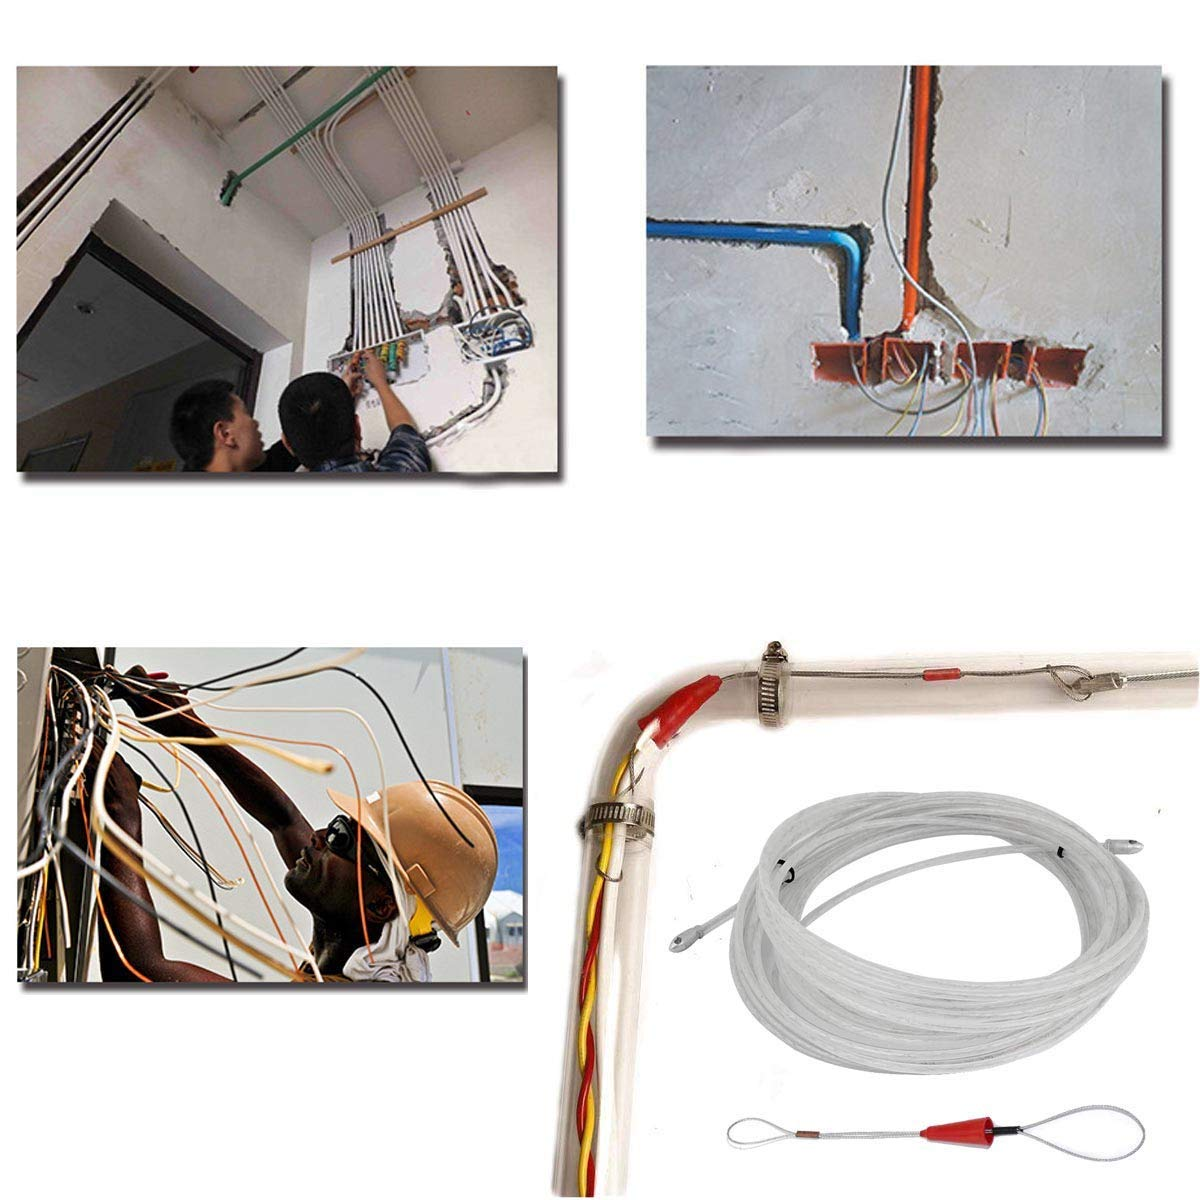 RUNCCI Guia Pasacables guia para pasar cables Guias Pasacables- Cable de Alimentaci/ón El/éctrico-Guia pasacables 15M Kit de Enhebrado de Cables